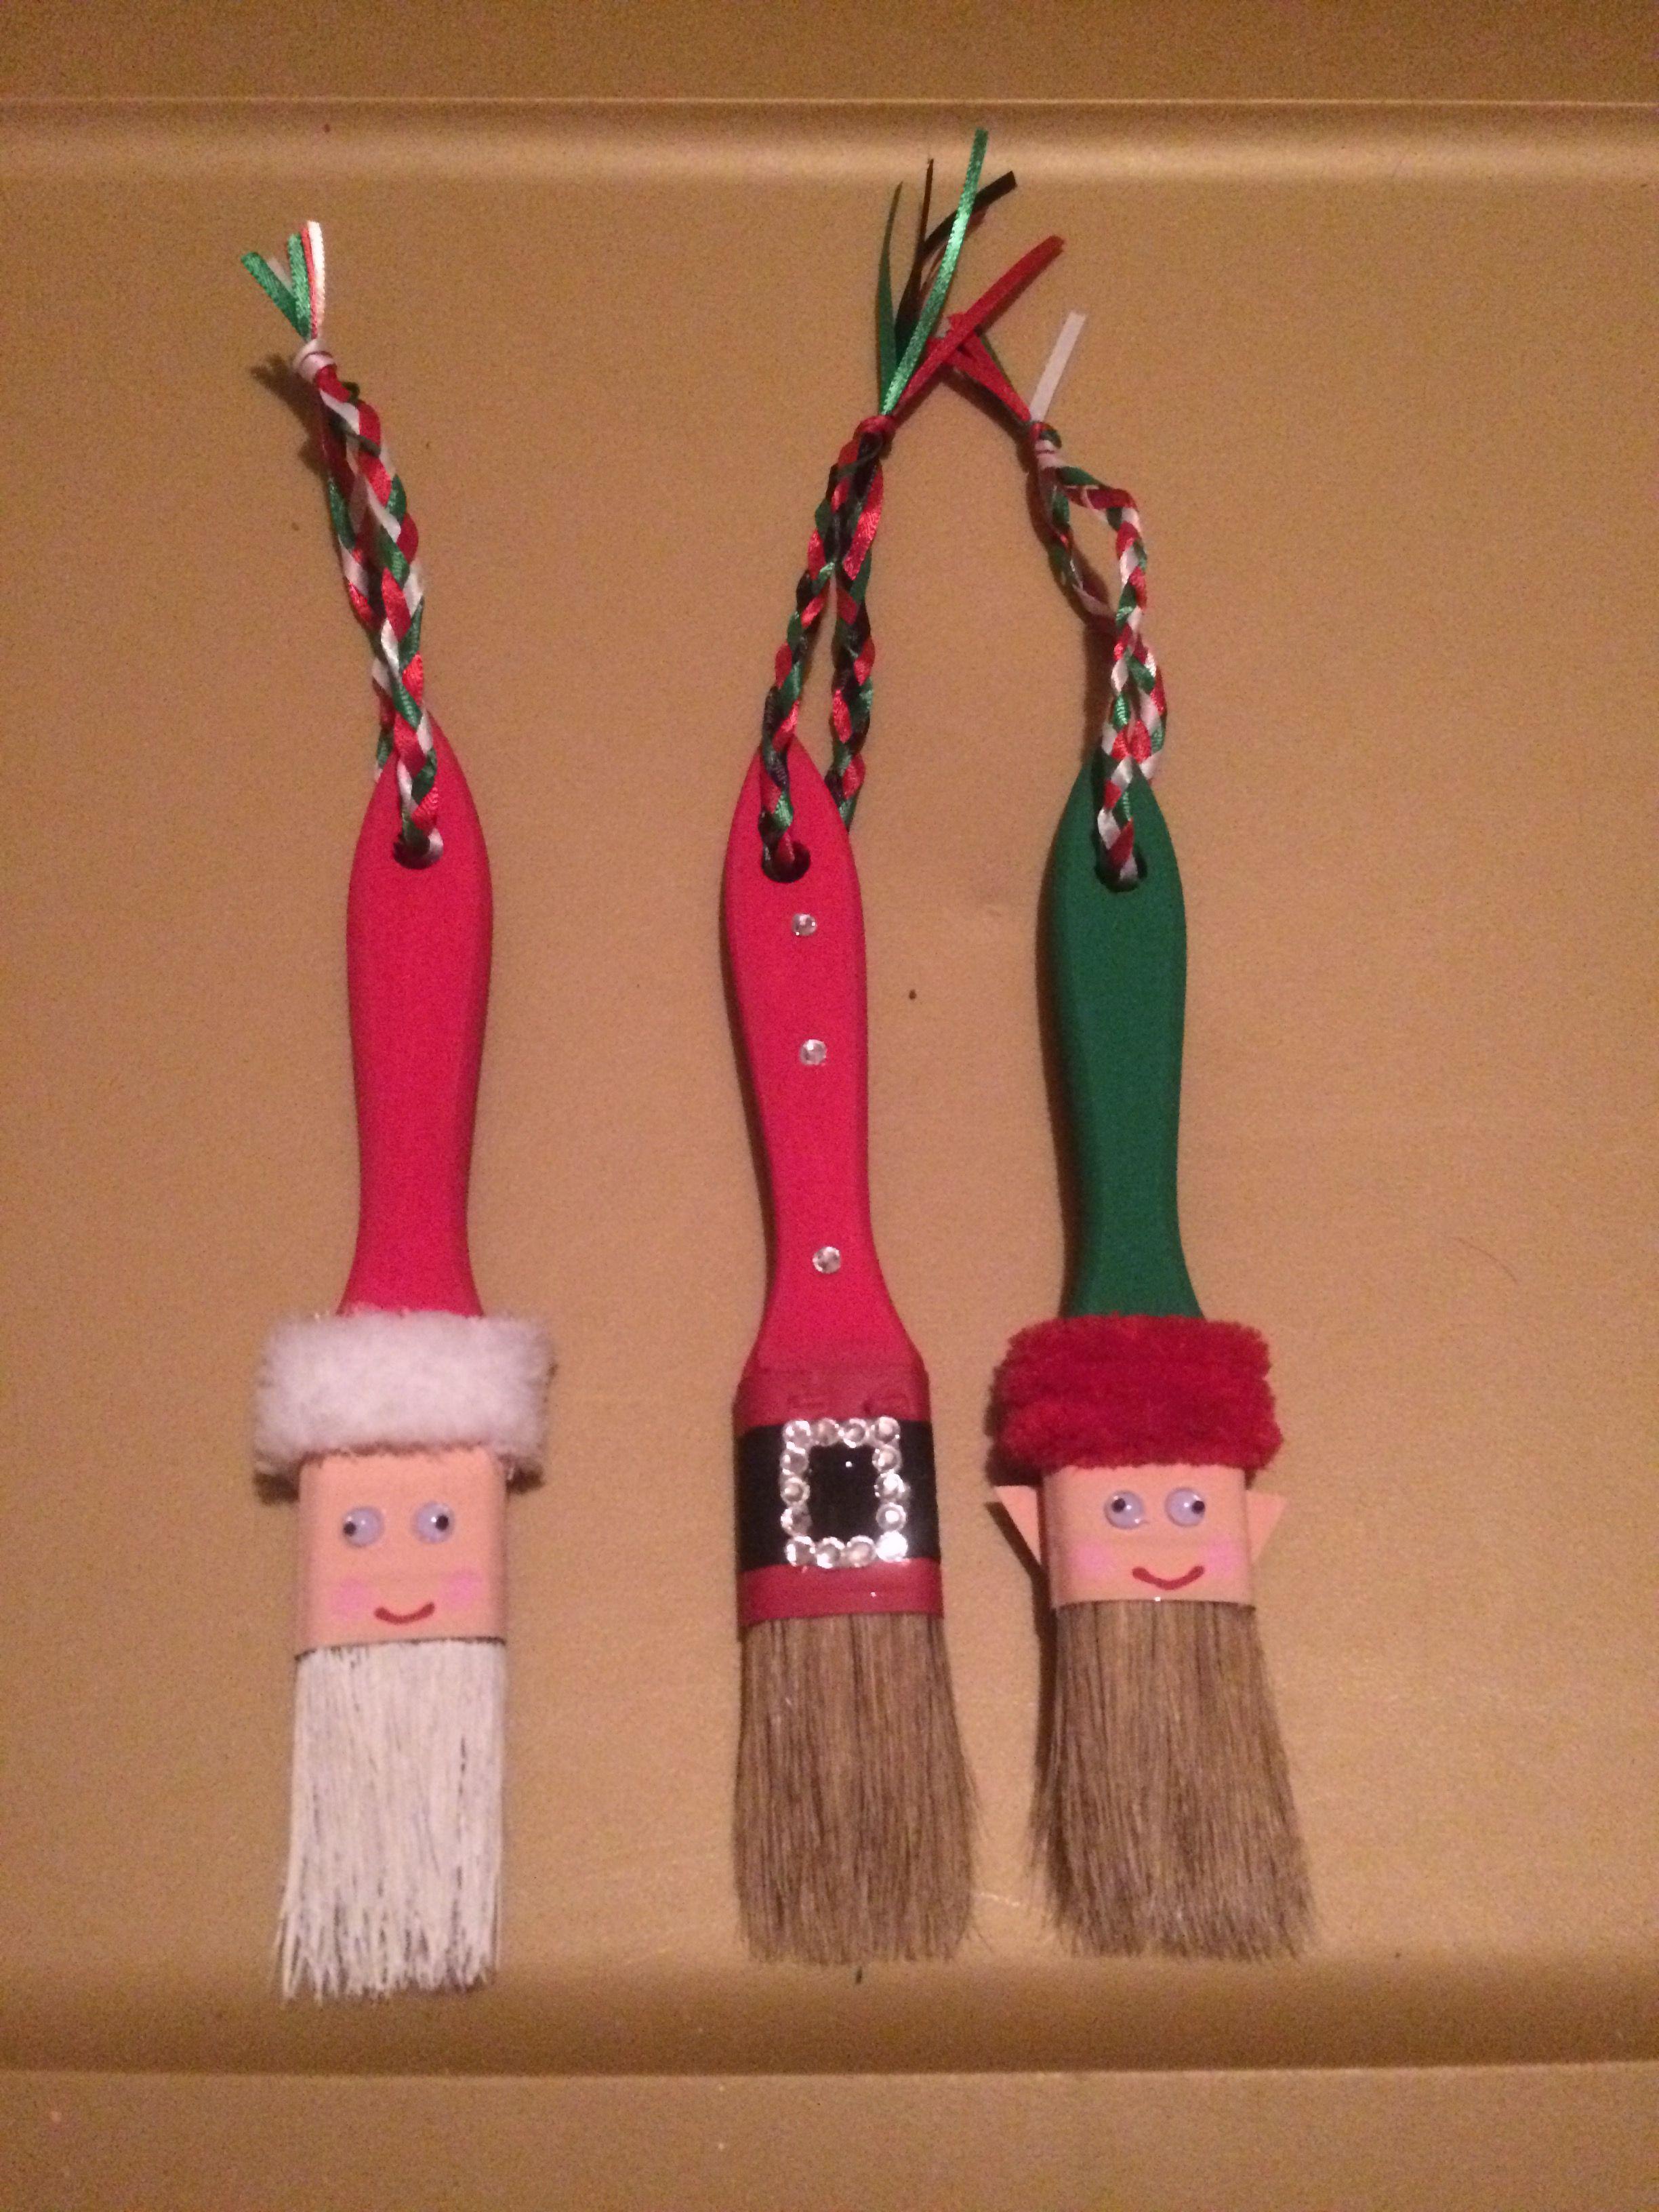 Santa And Elf Paintbrushes Christmas Crafts Girls Night Crafts Xmas Crafts